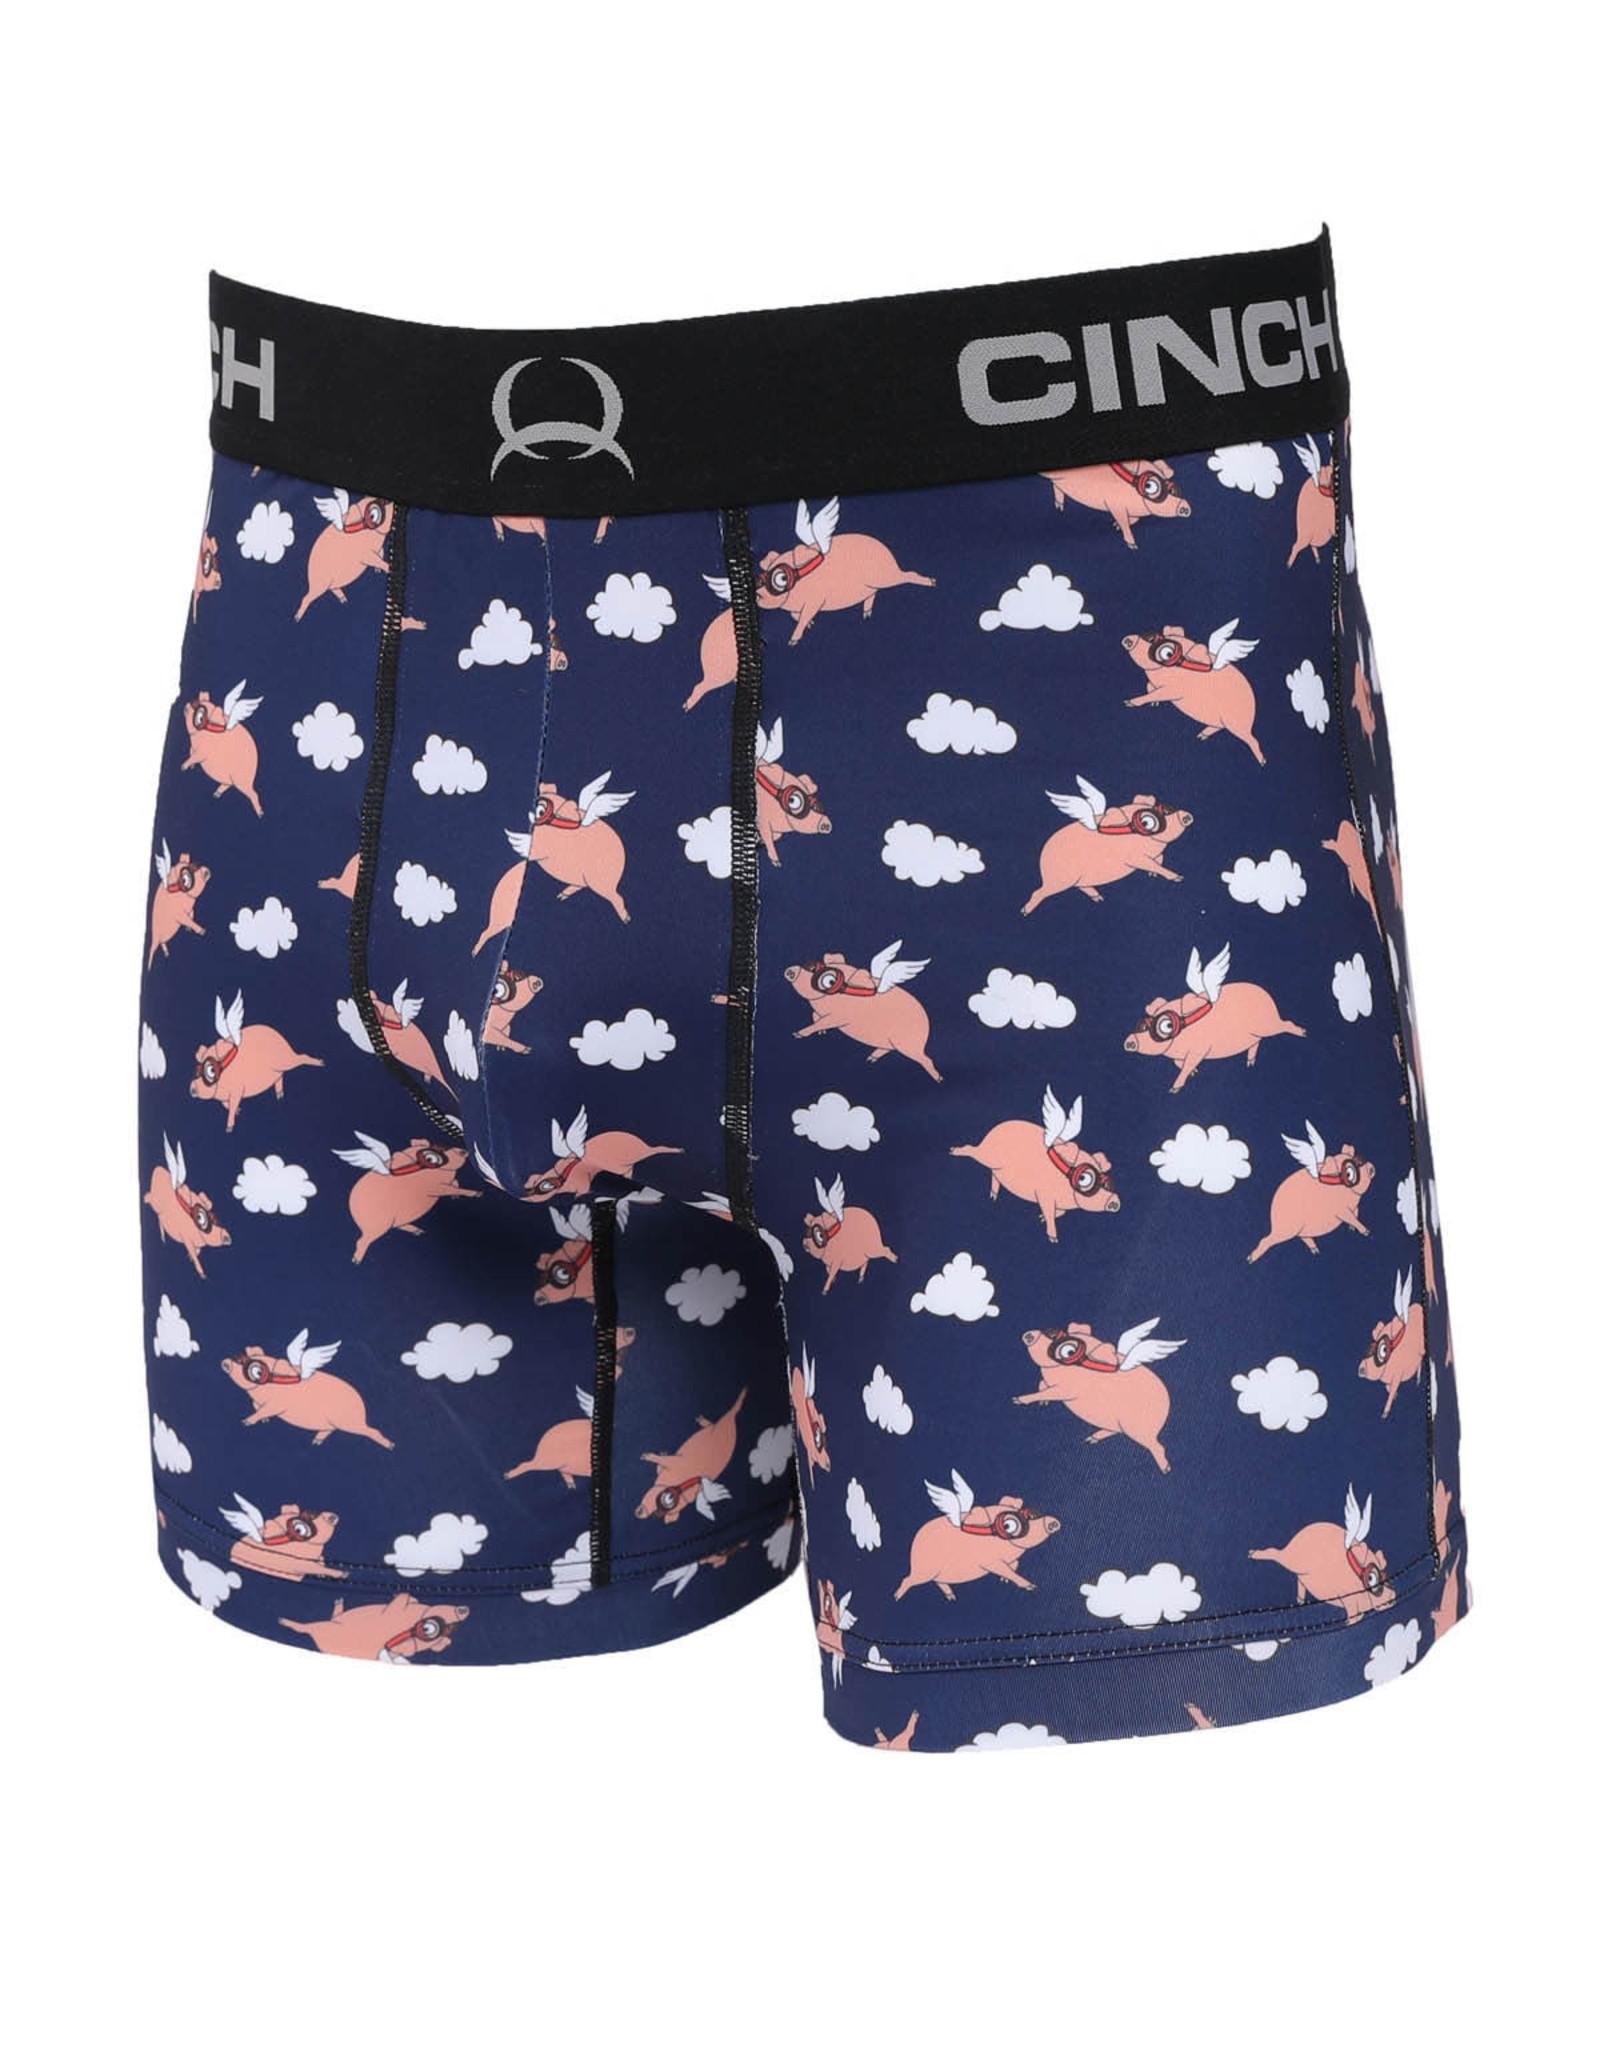 "Cinch Mens Cinch Boxer Brief 6"" When Pigs Fly"